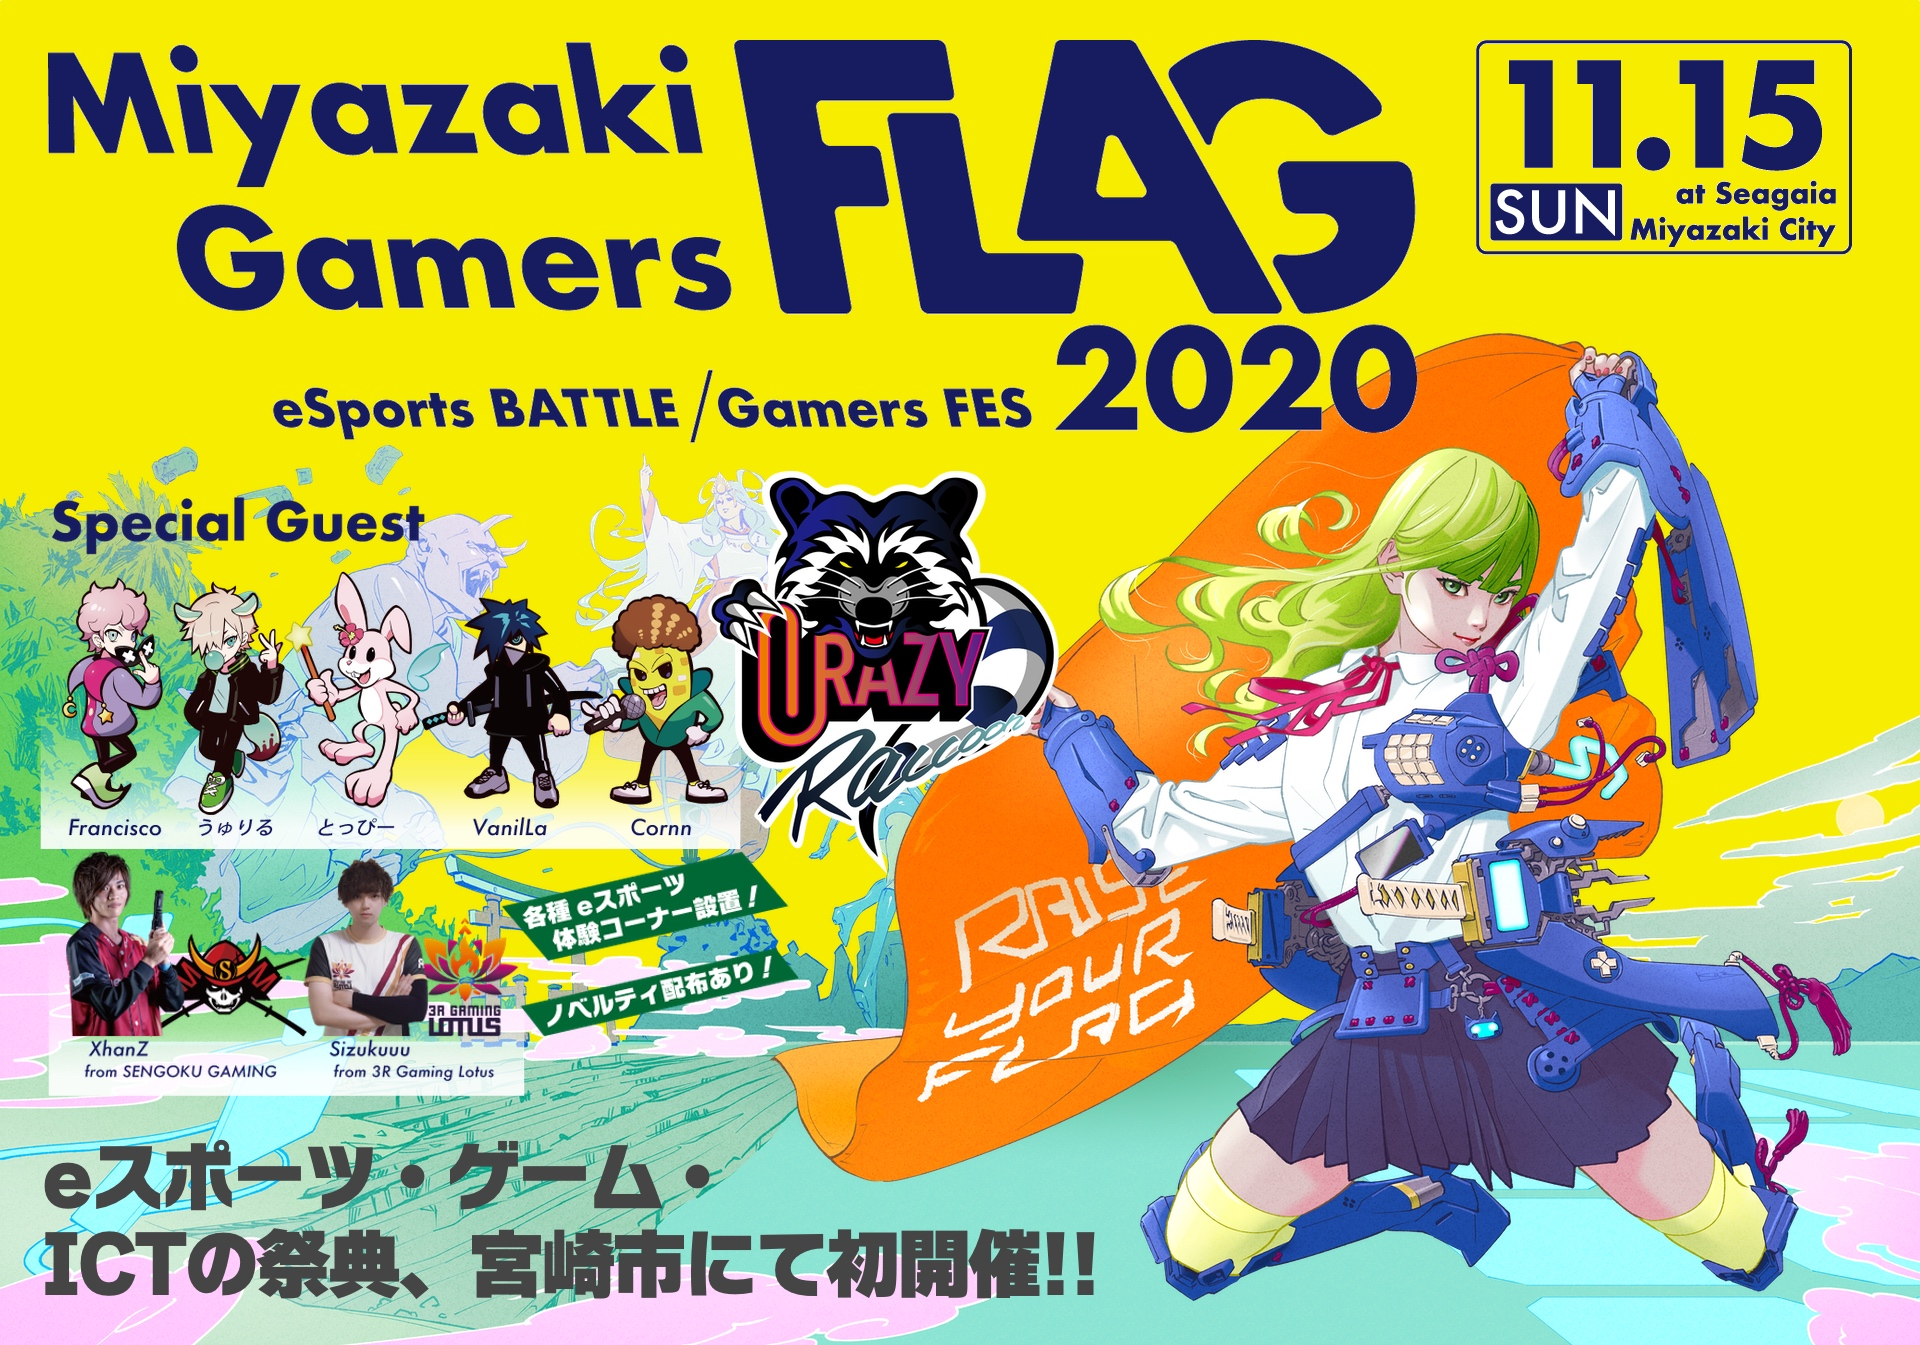 Miyazaki Gamers FLAG2020